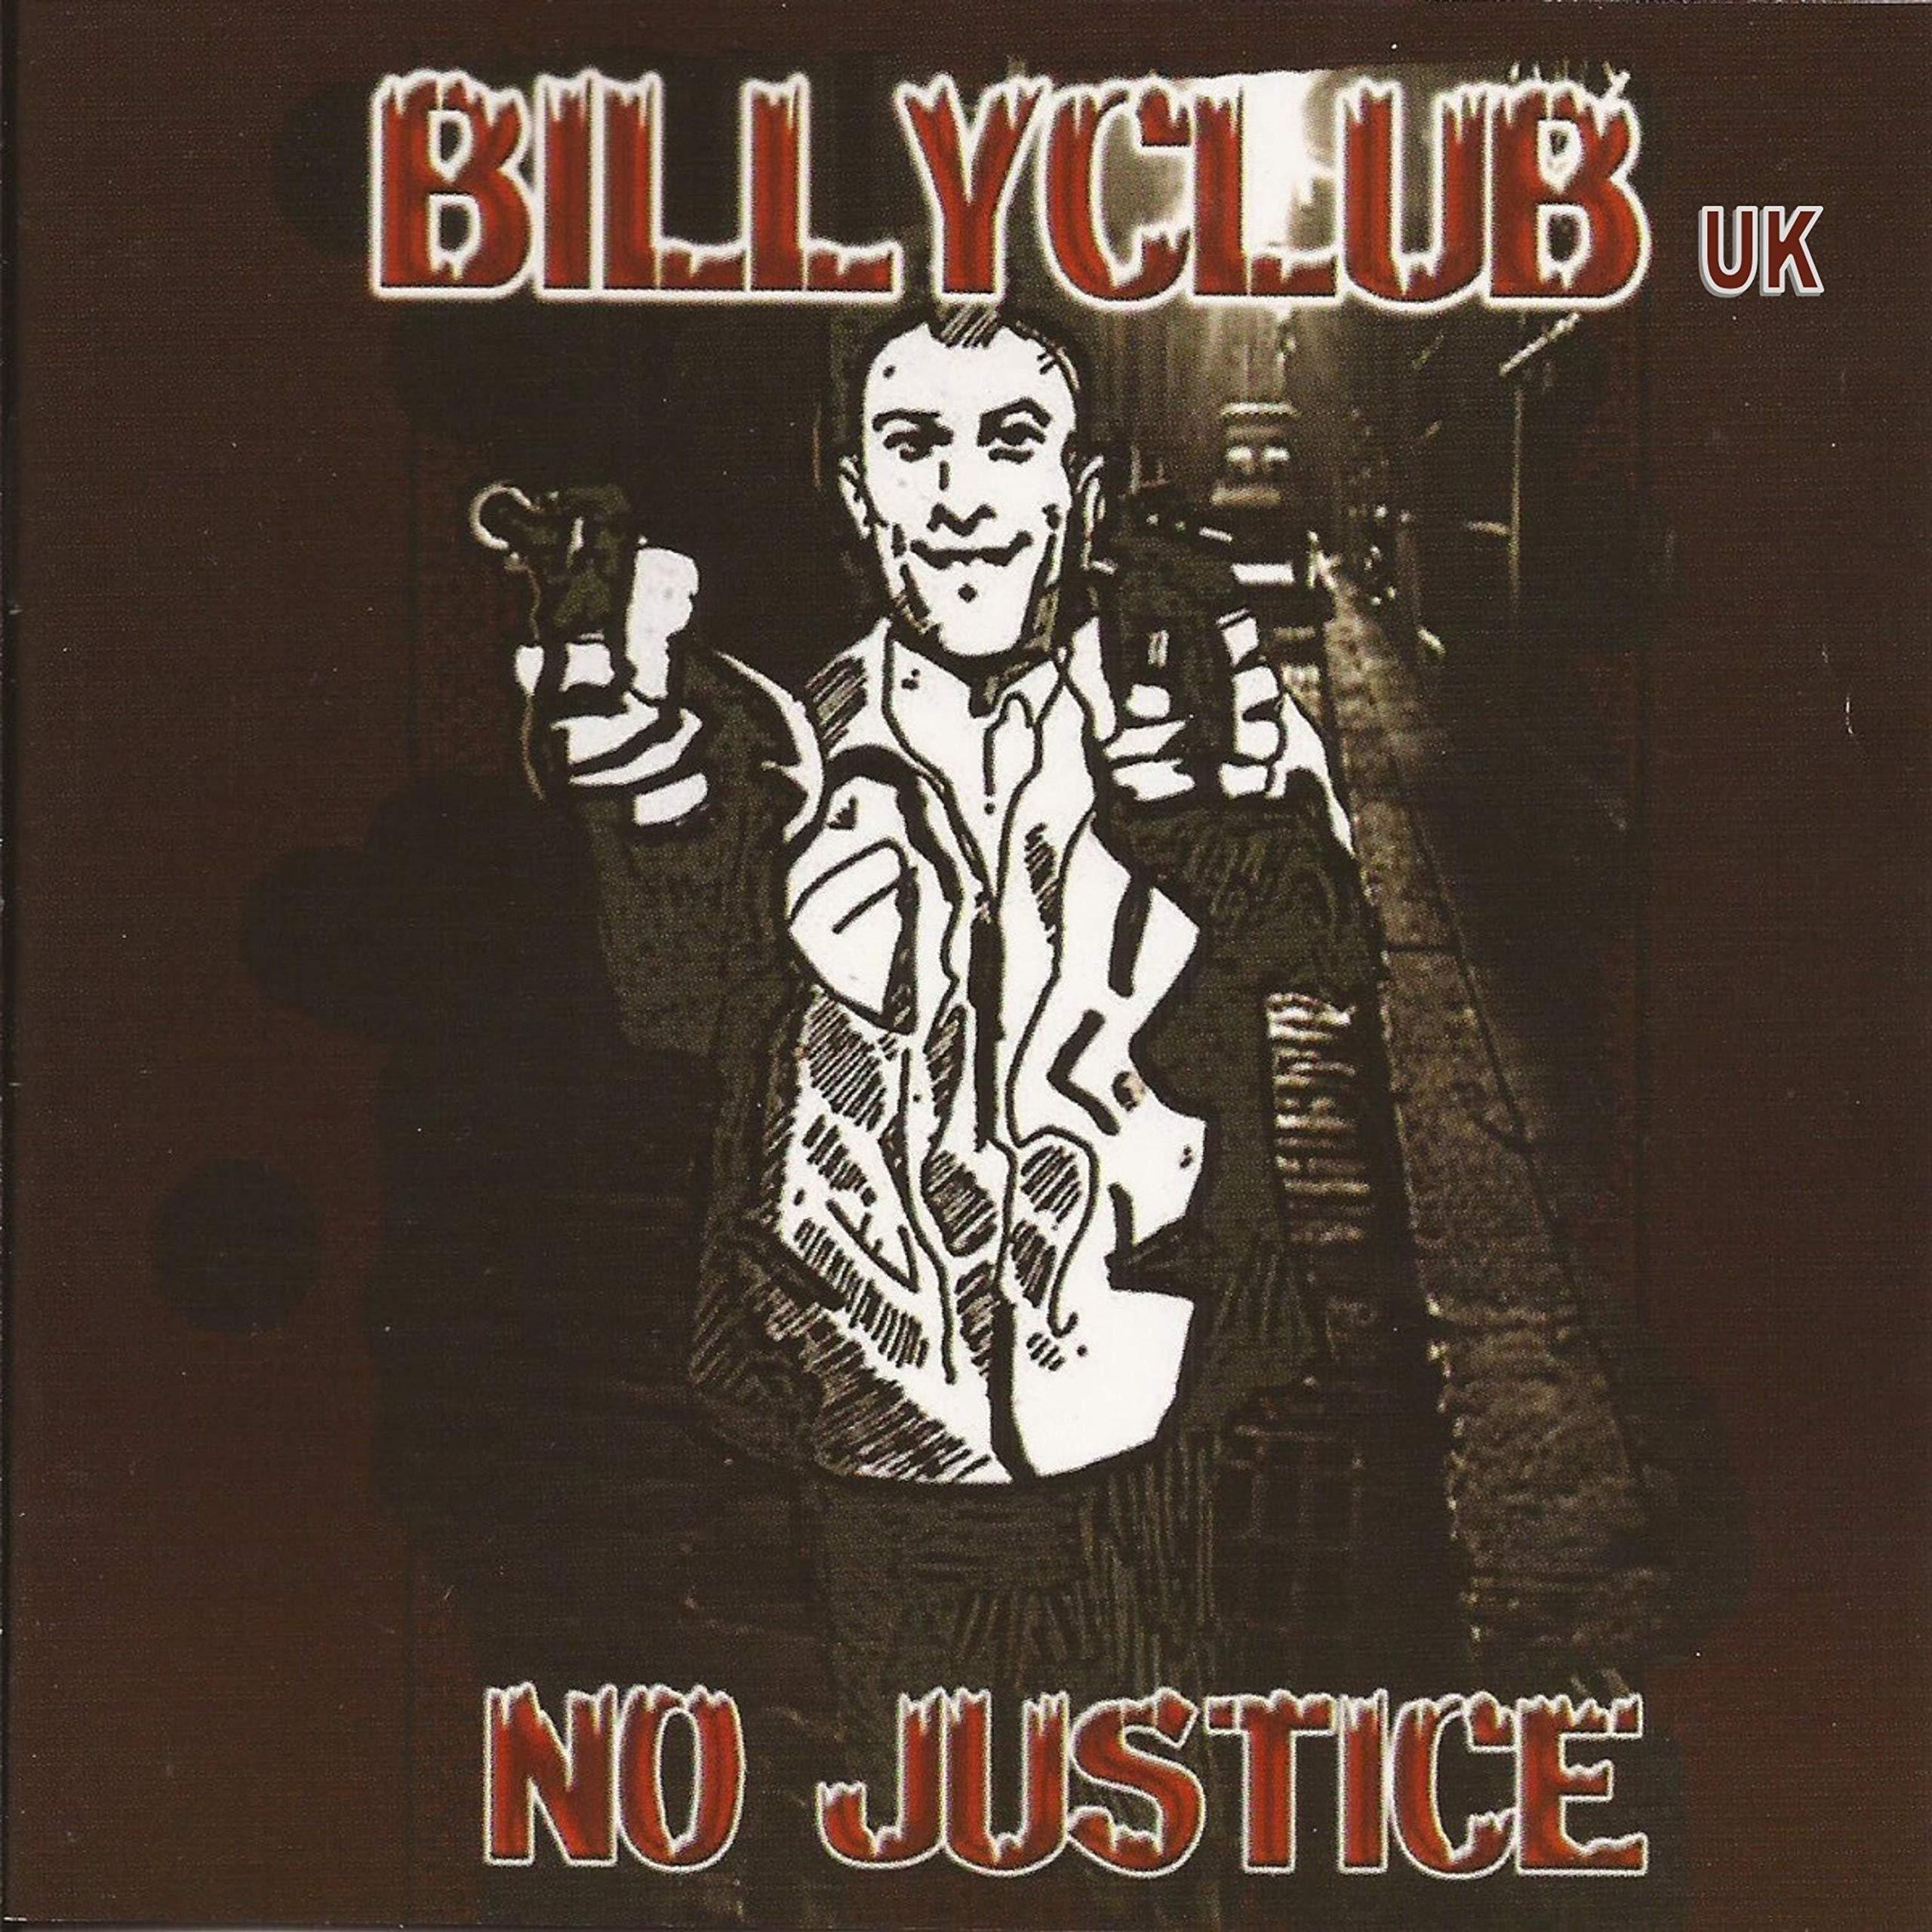 Billyclub-No Justice-CD-FLAC-2007-FiXIE